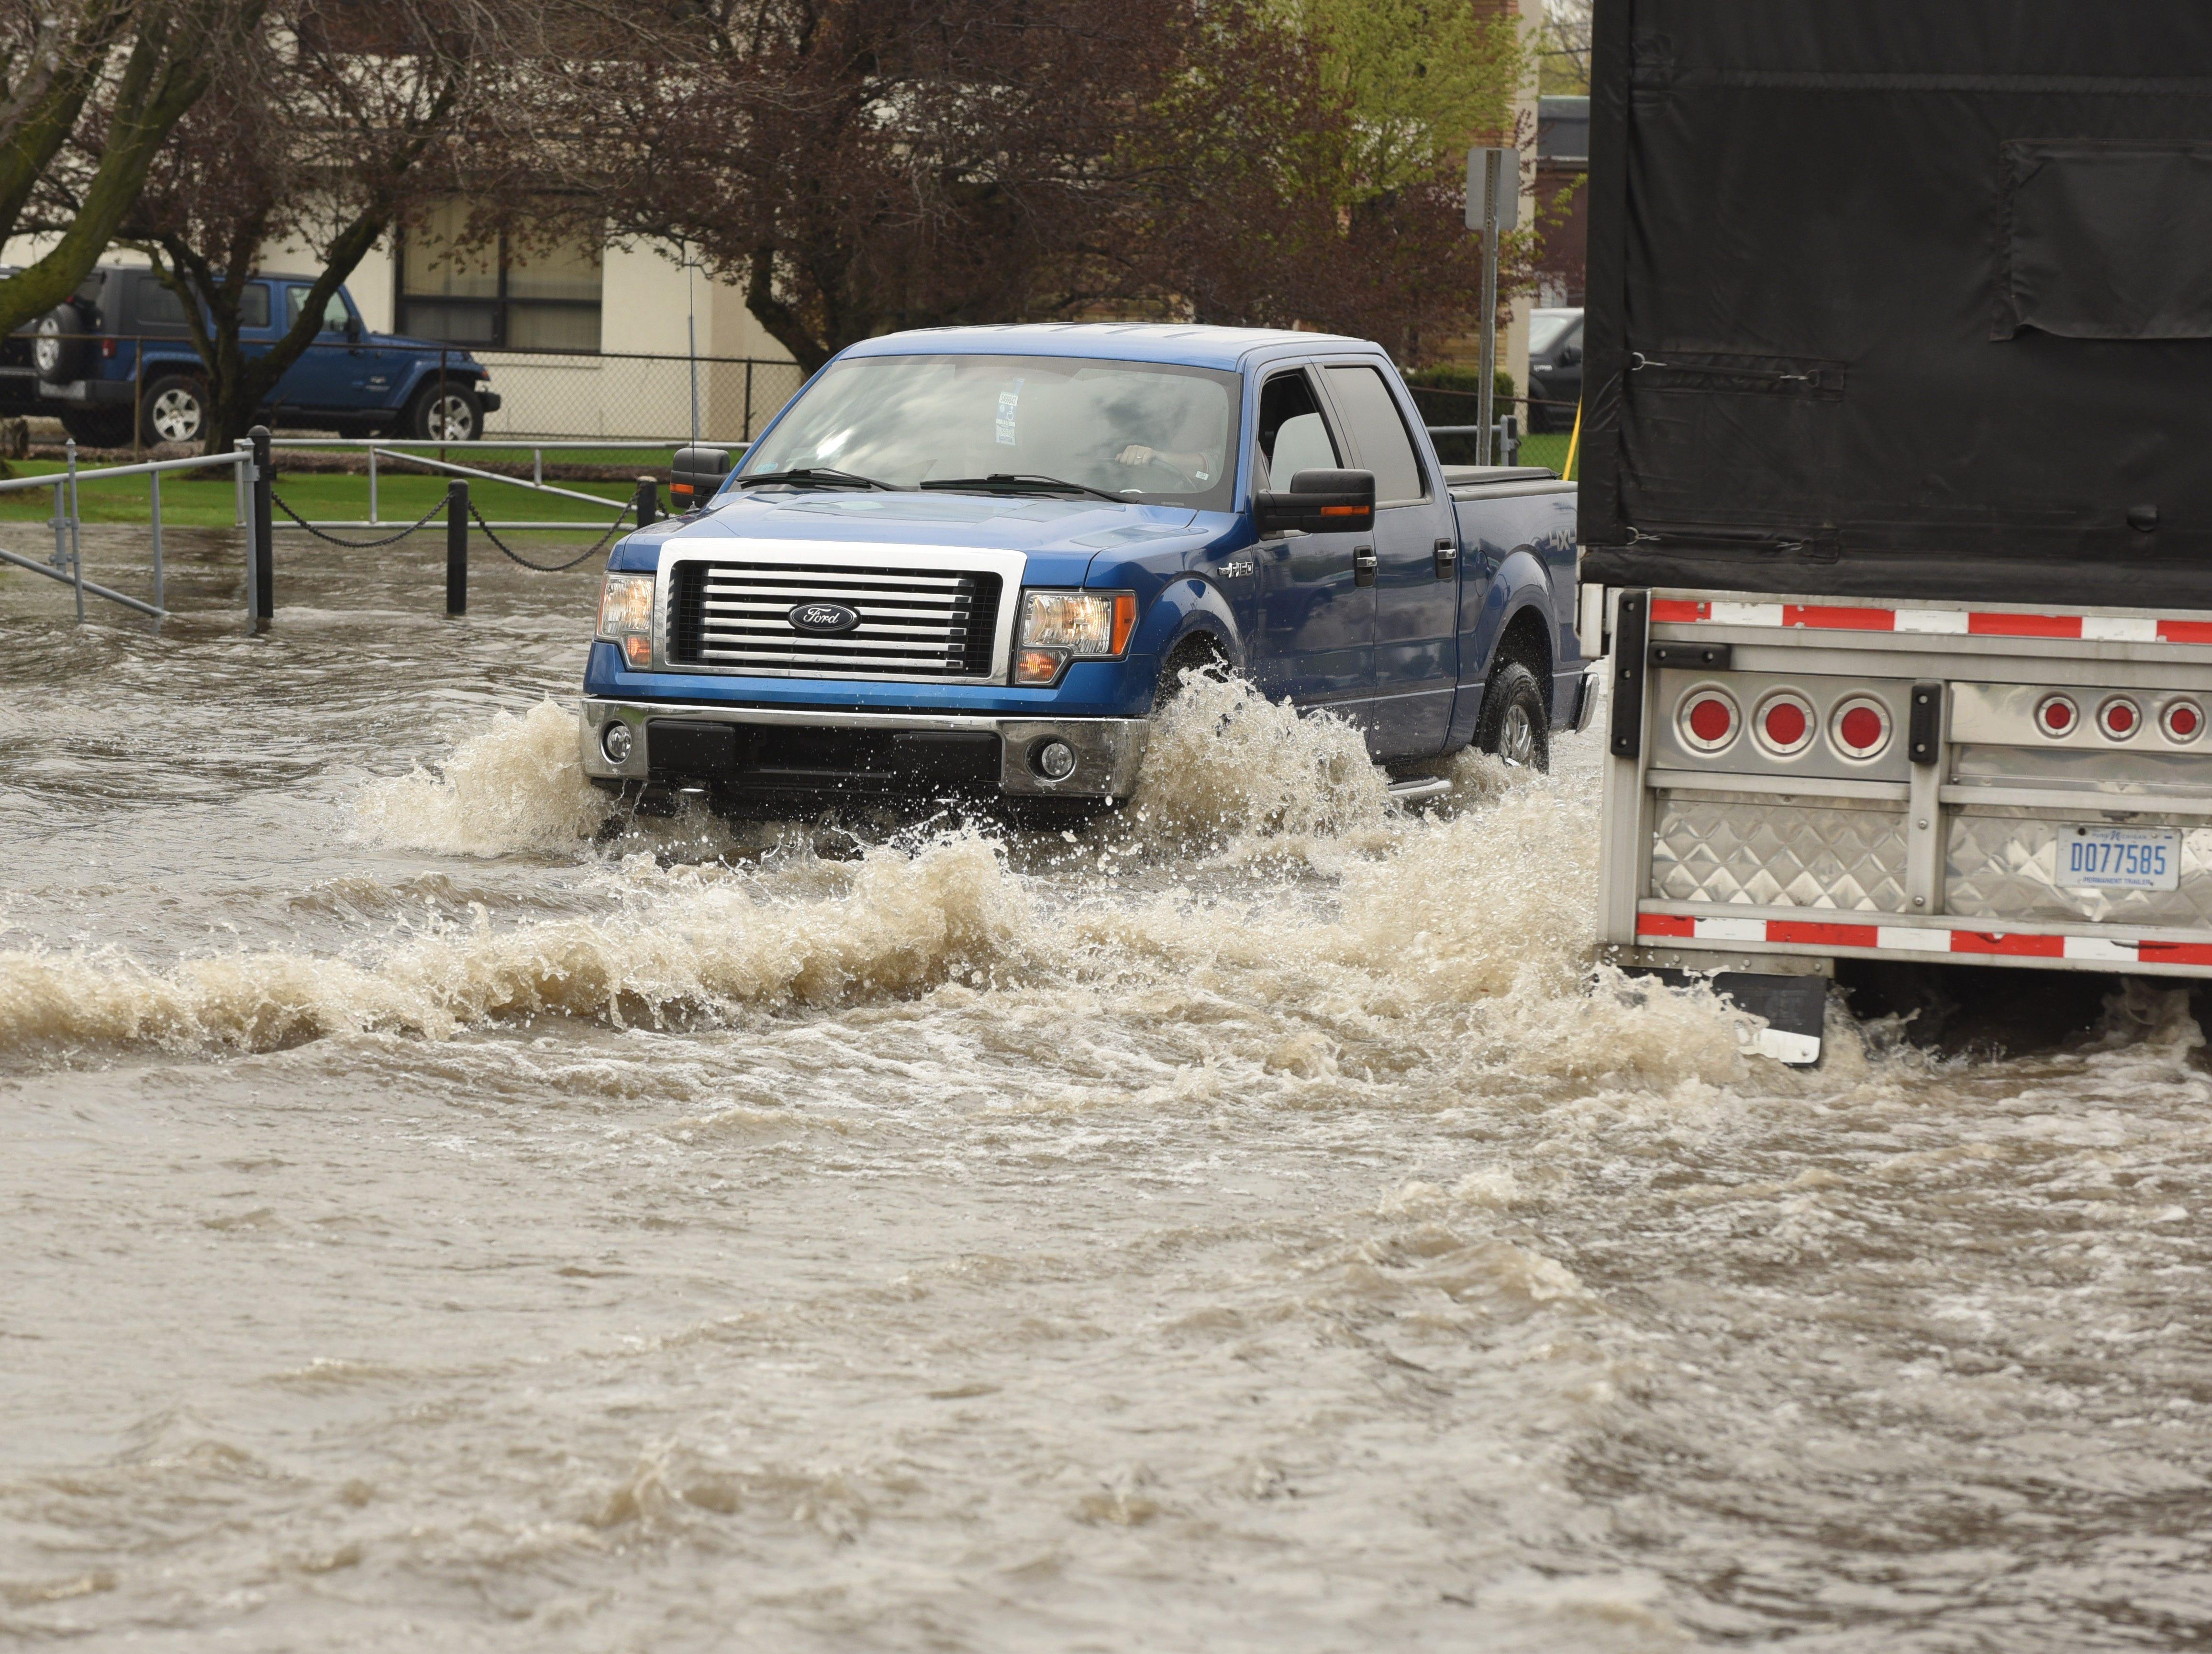 A motorist plows through flood waters along Monroe Blvd near Ecorse Road in Taylor.